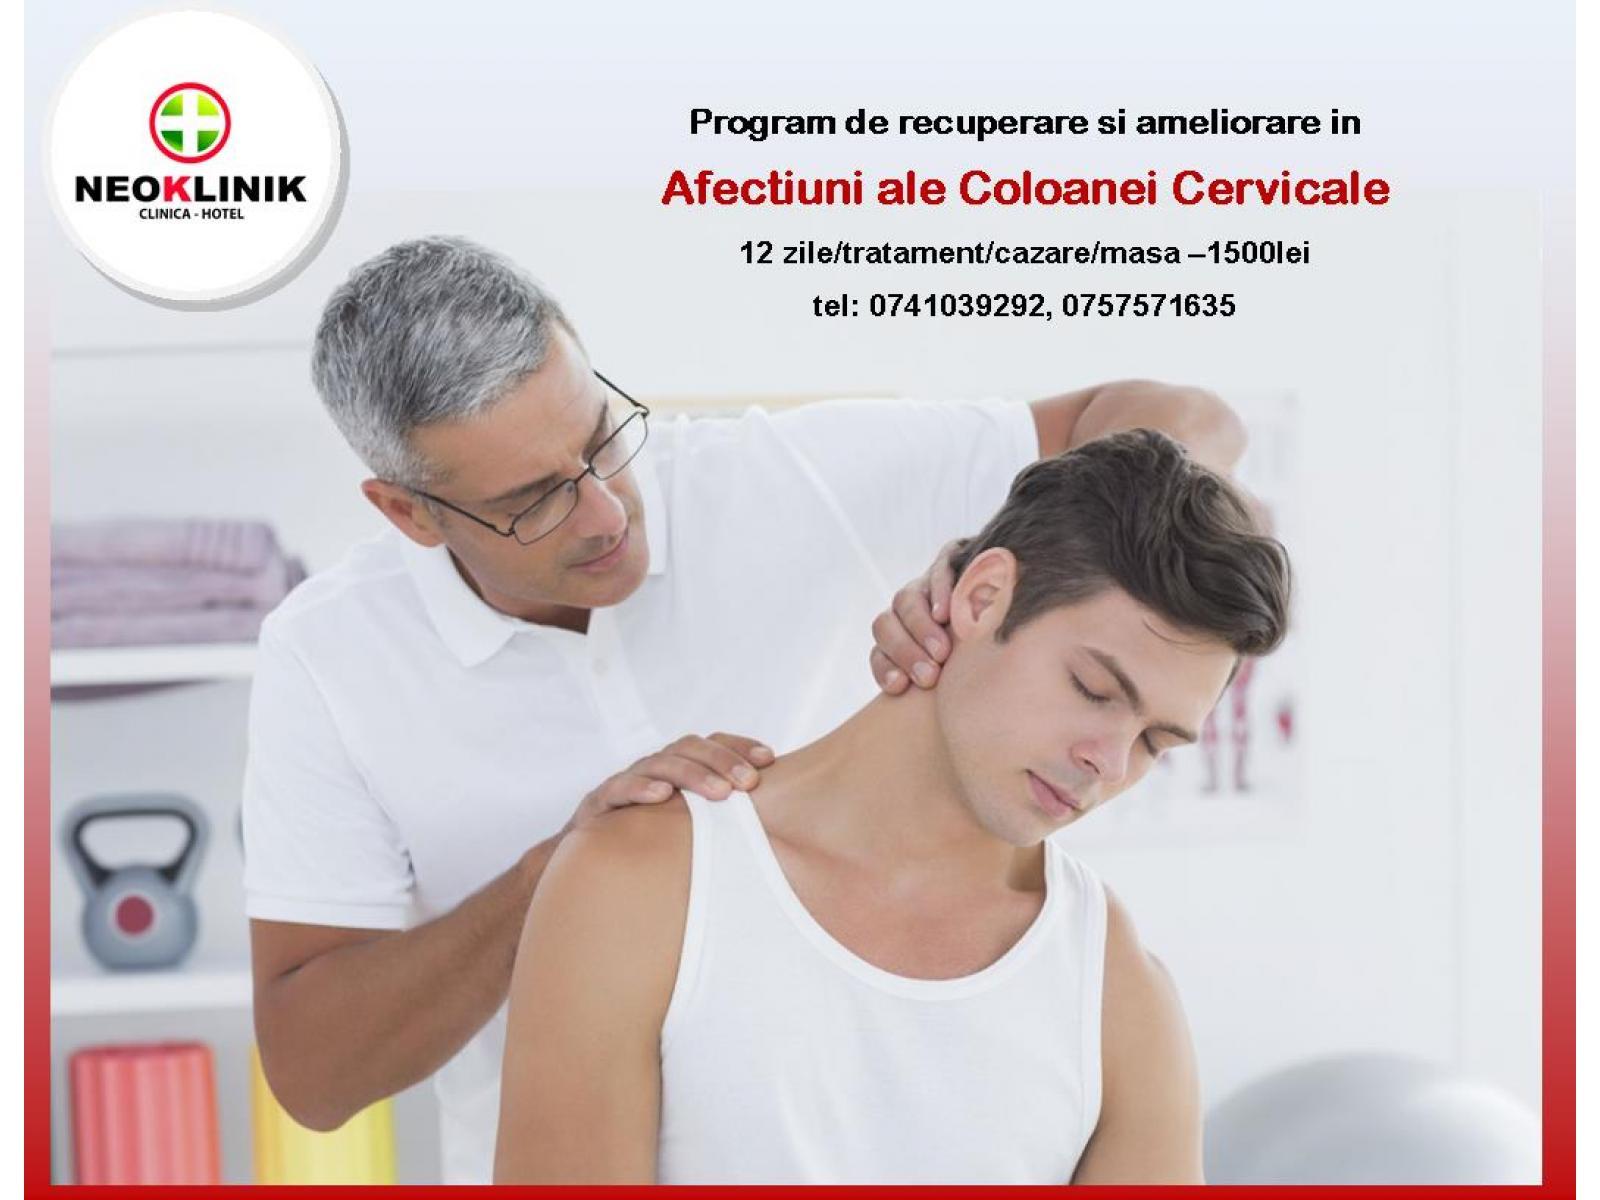 NeoKlinik - Coloana_Cervicala_2.jpg